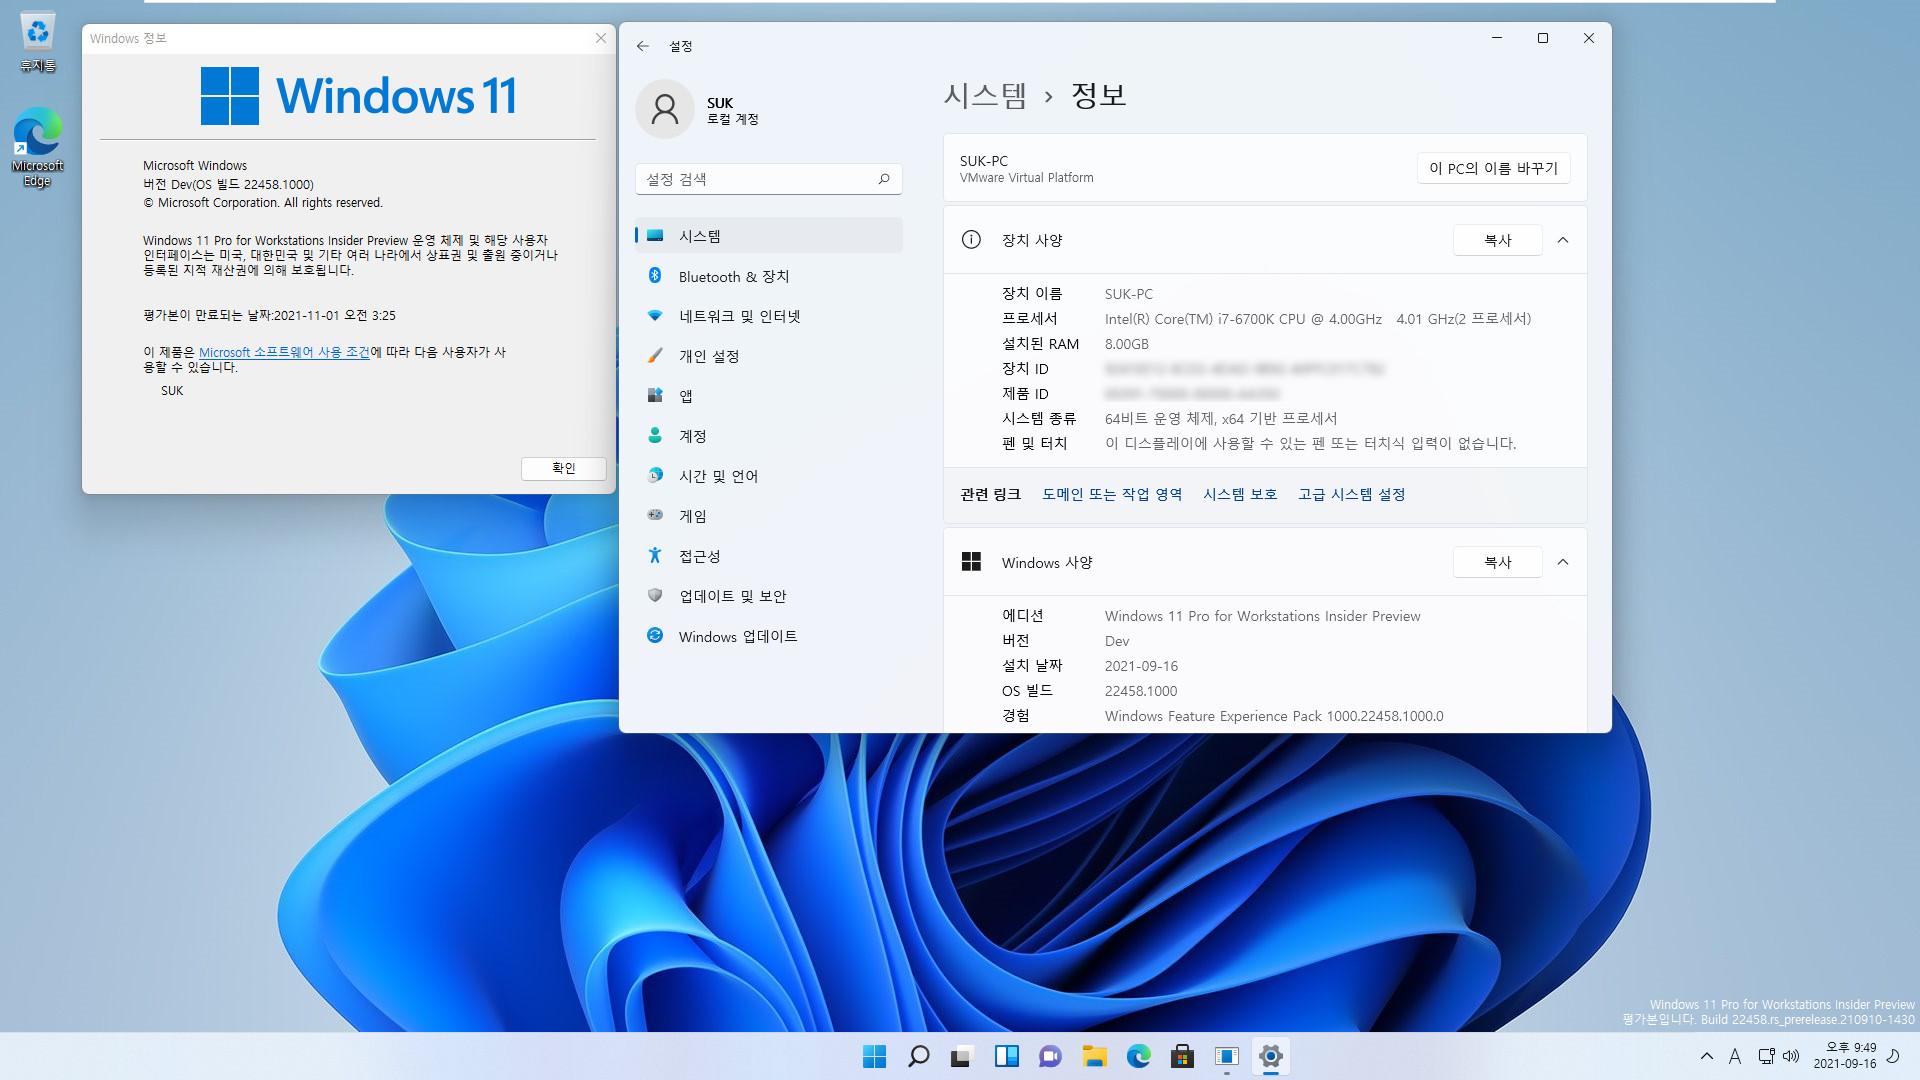 Windows 11 인사이더 프리뷰 - 버전 Dev (OS 빌드 22458.1000) 나왔네요 - 개발자 채널 - 한글 UUP를 ISO로 만드는데 실패하여 윈도우 업데이트로 UUP 다운로드하여 ISO 만들었습니다. 한글 64비트 모든 에디션 + 우회  2021-09-16_214958.jpg